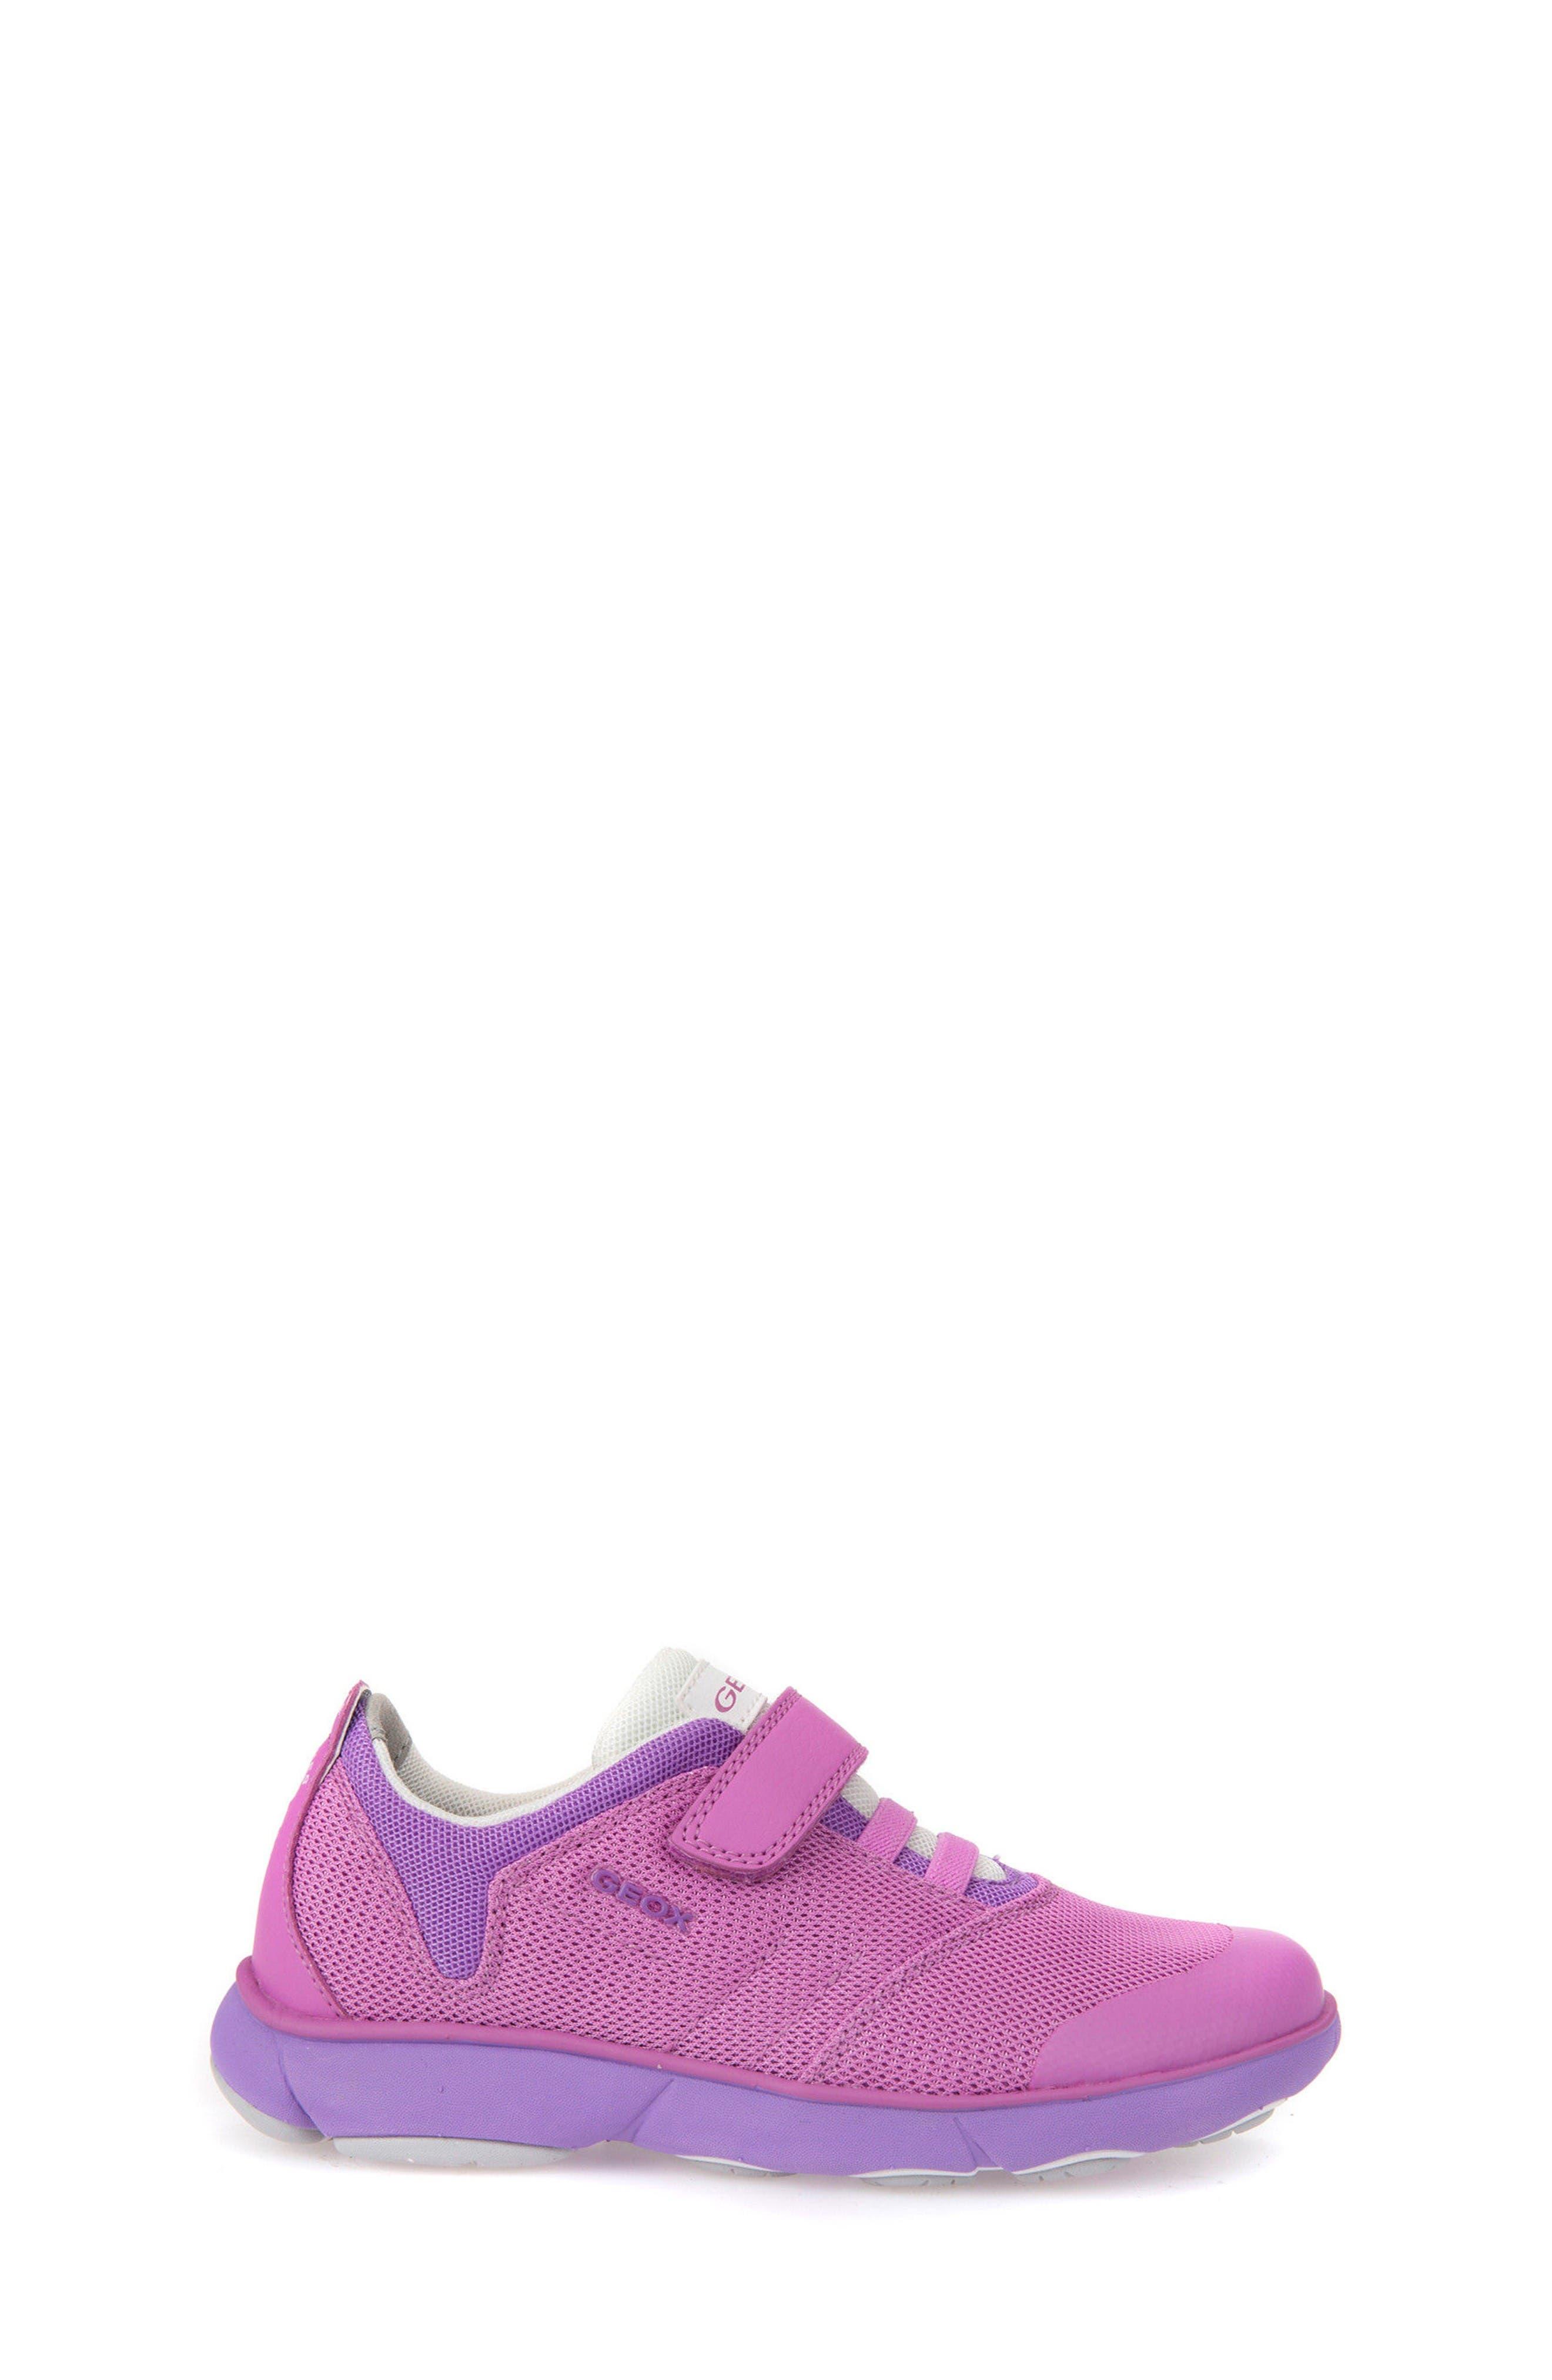 Jr Nebula Sneaker,                             Alternate thumbnail 3, color,                             Fuchsia